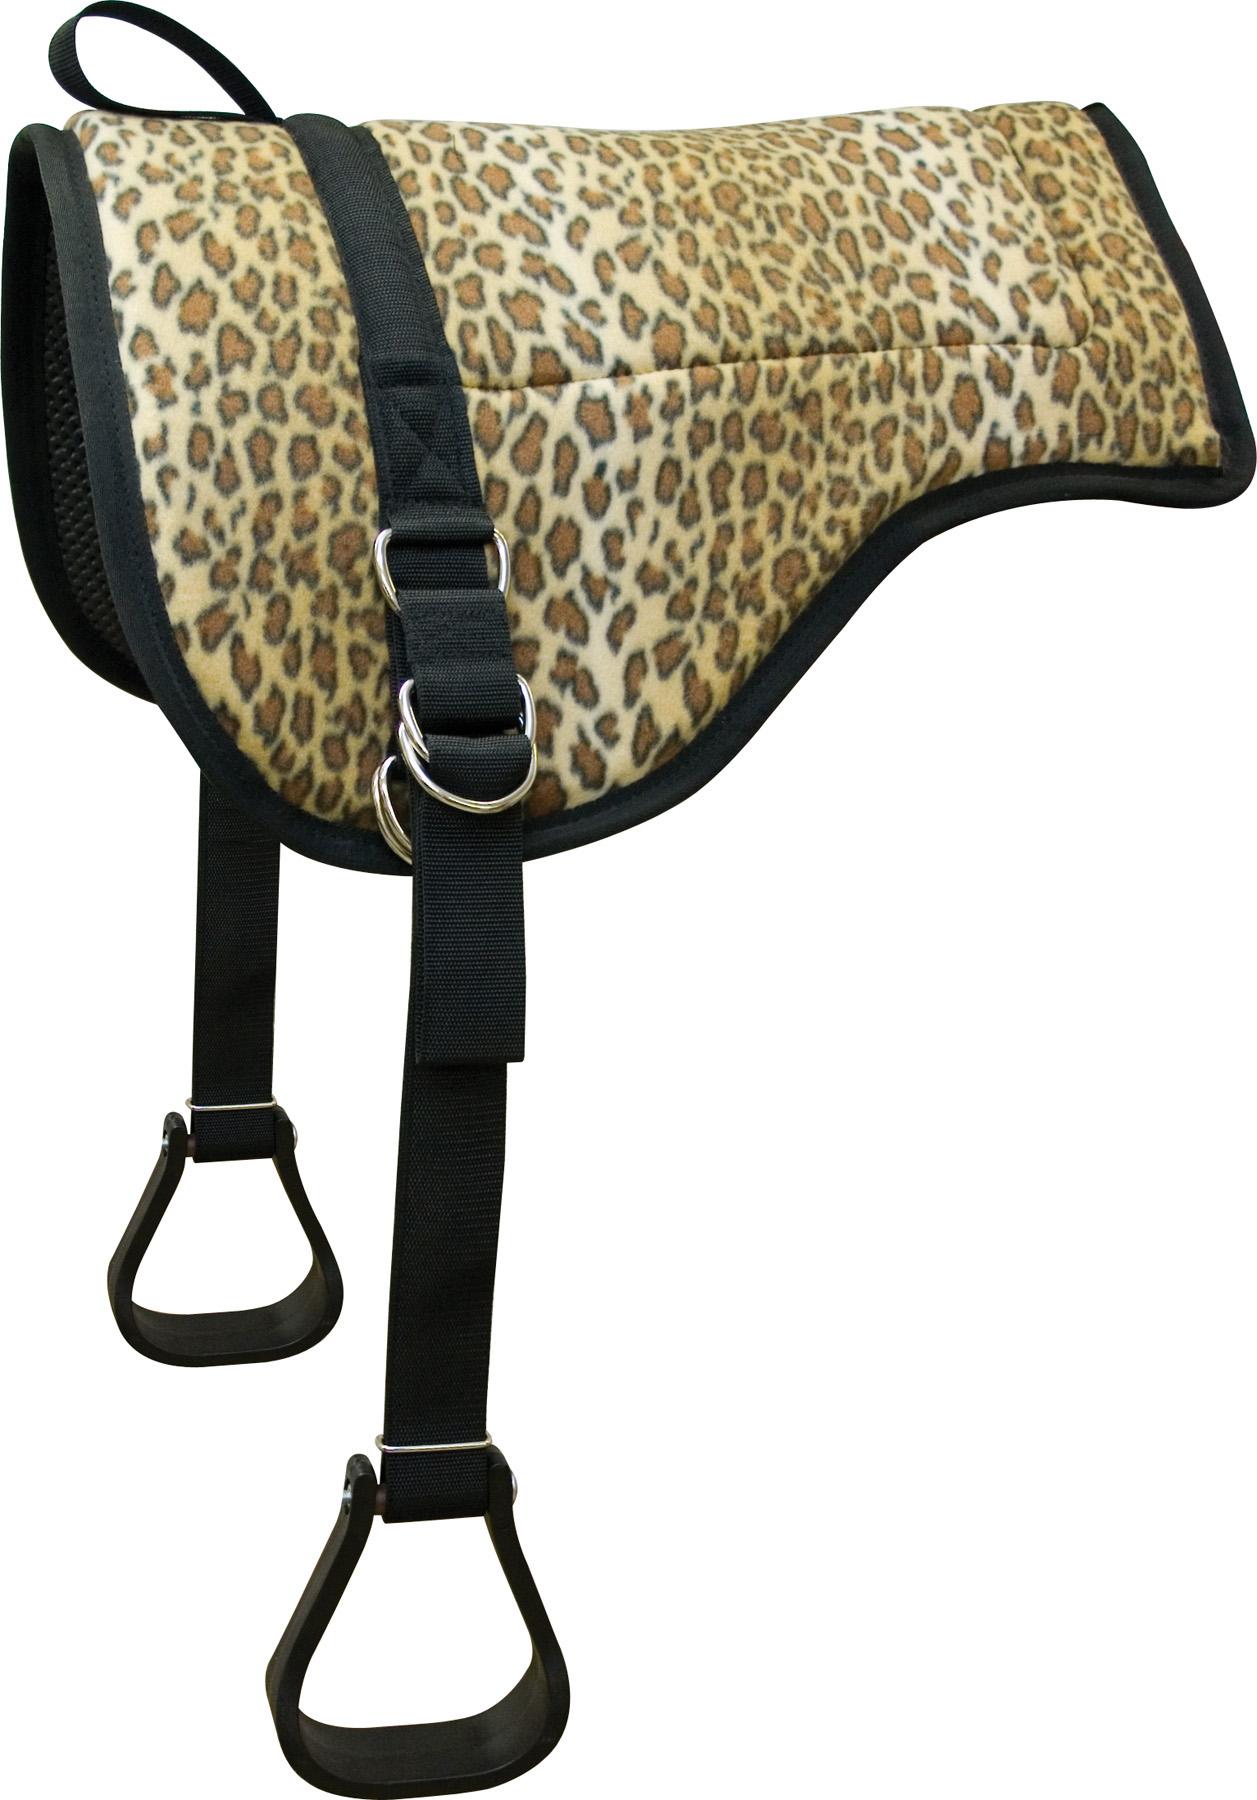 ABETTA Leopard Bareback Pad